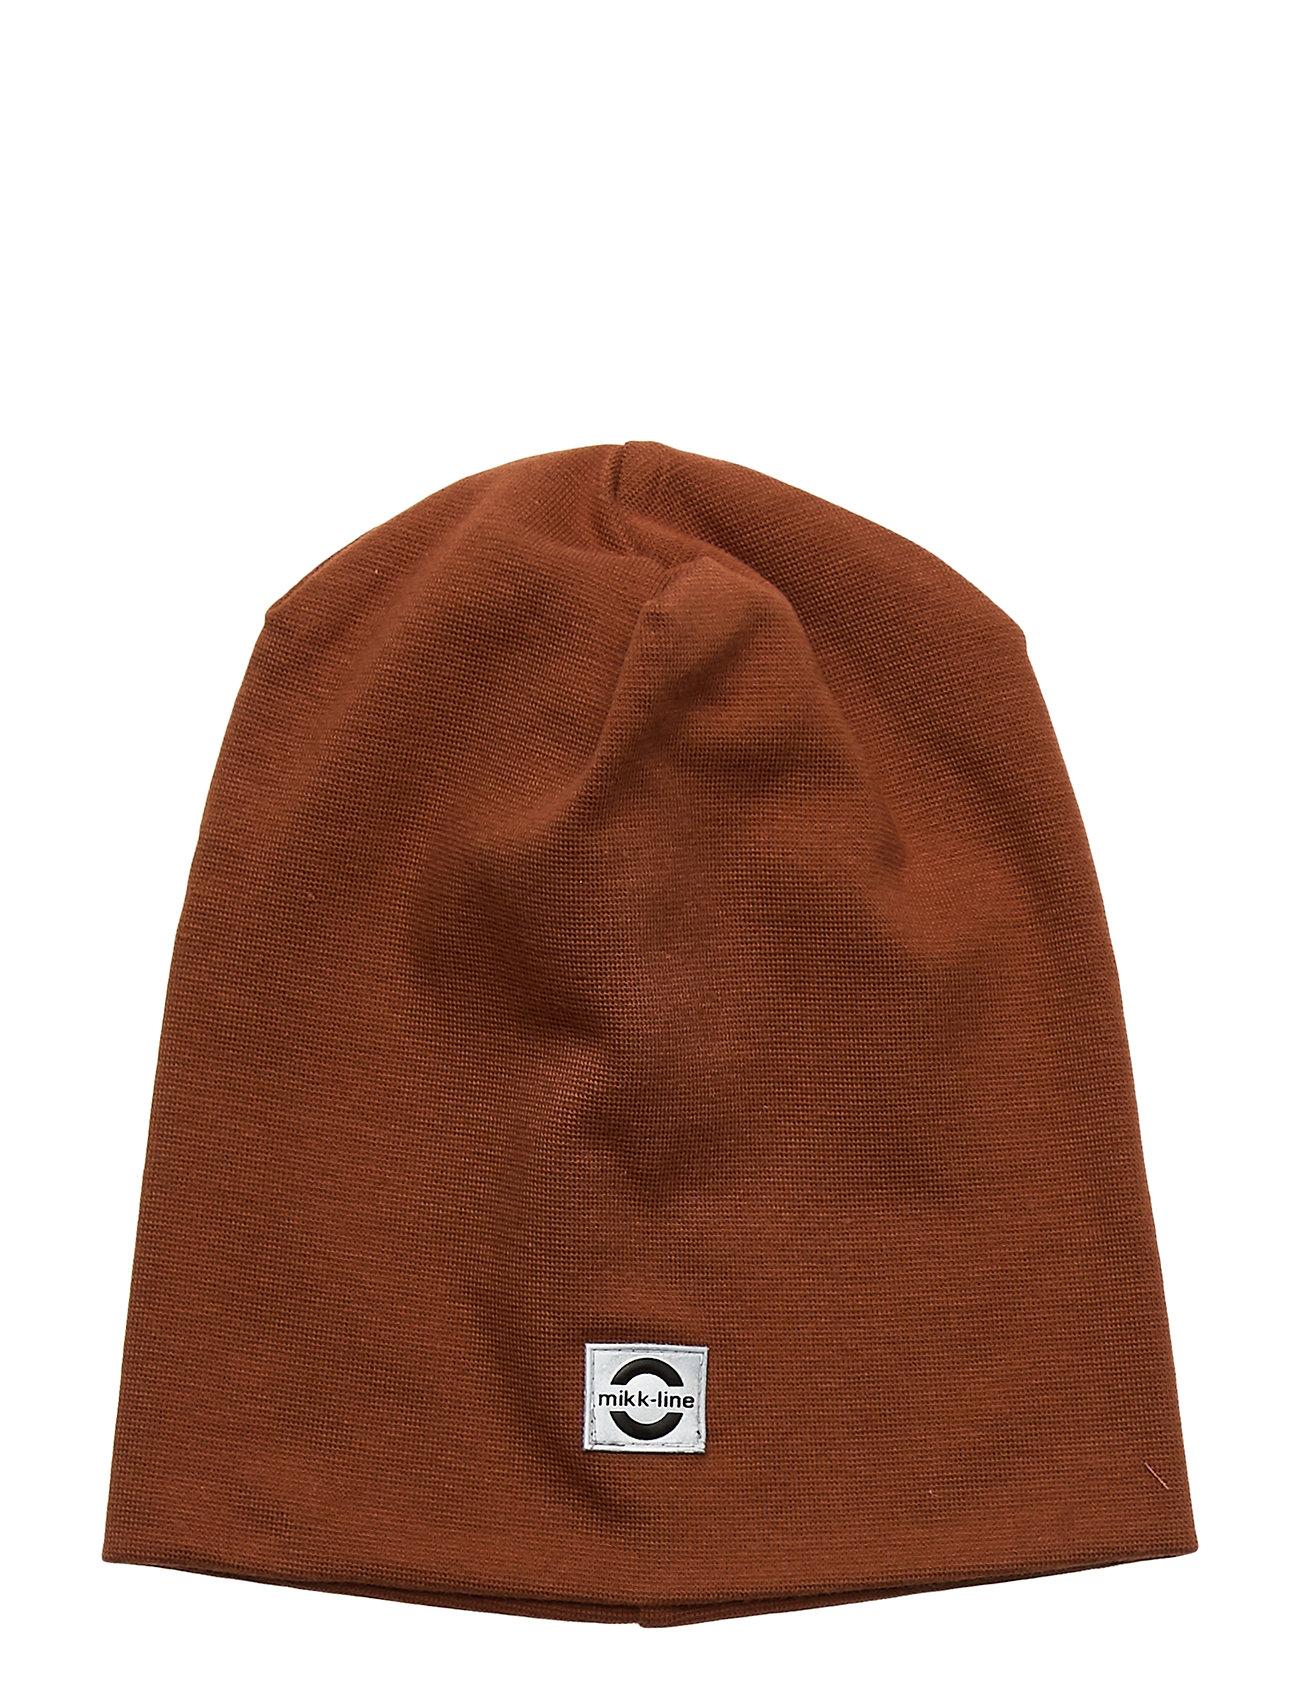 Image of Cotton Hat - Solid Accessories Headwear Hats Brun Mikk-Line (3406311233)